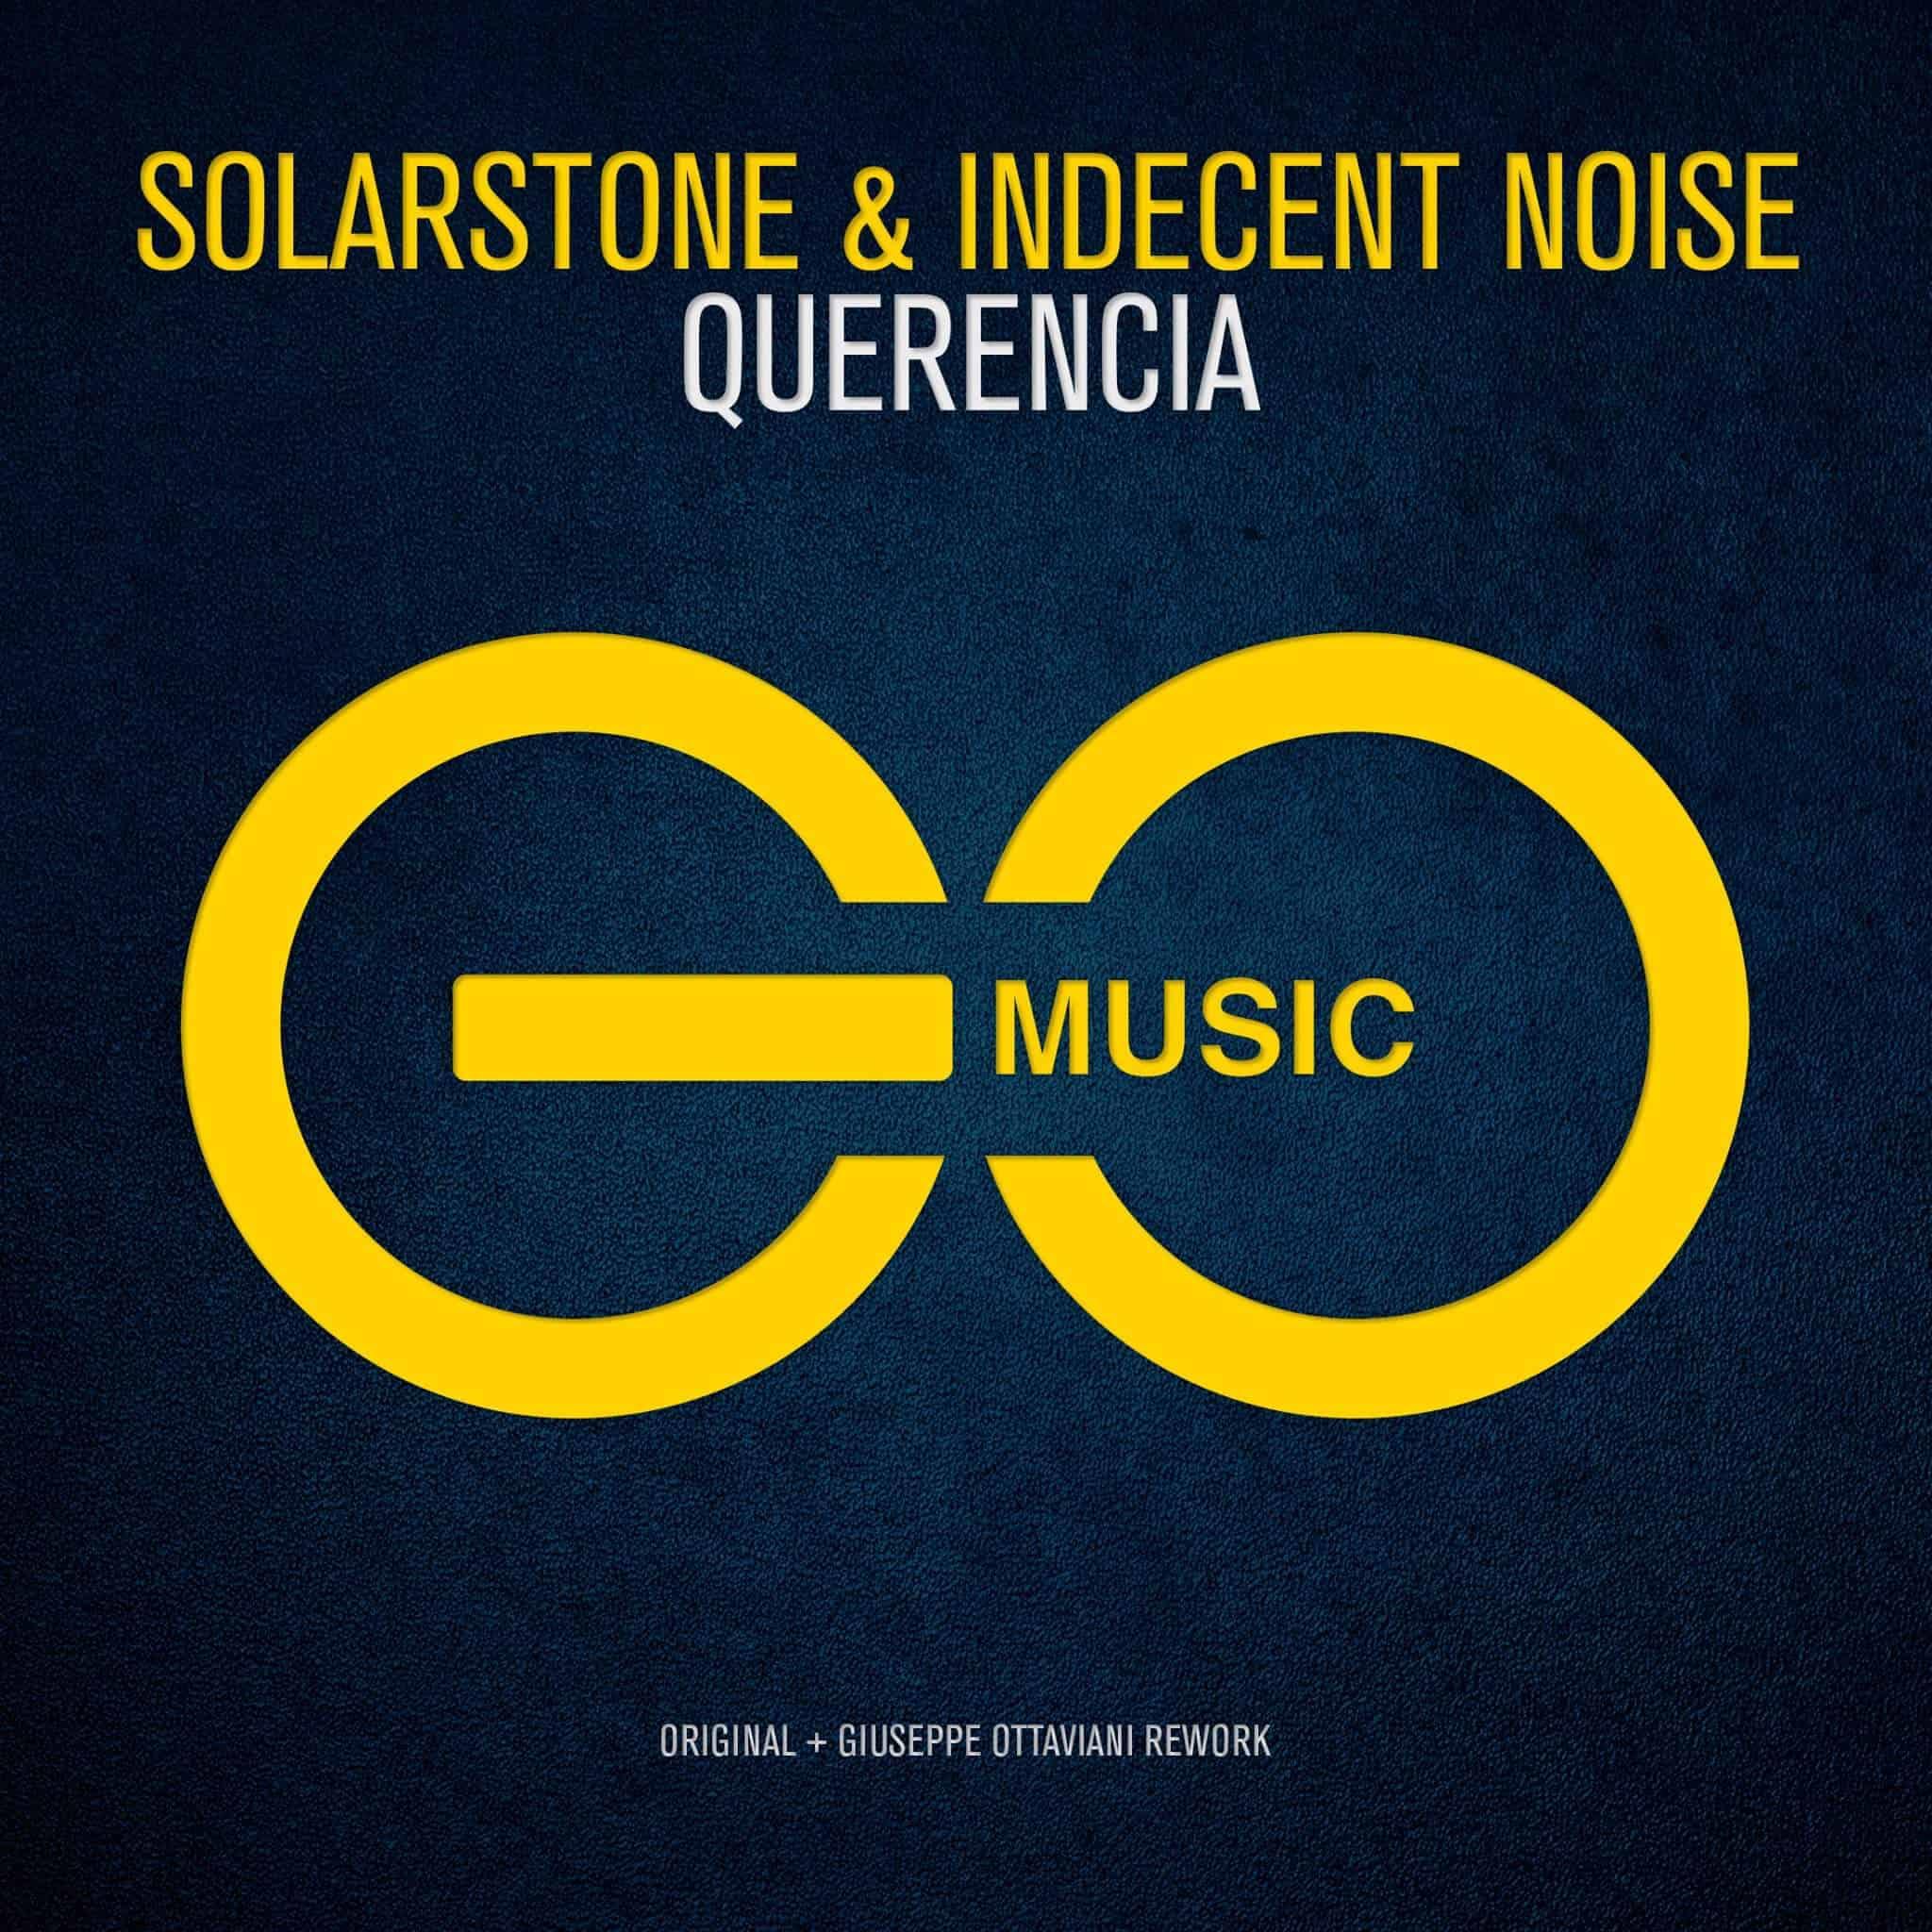 Solarstone & Indecent Noise – Querencia (Giuseppe Ottaviani Rework)